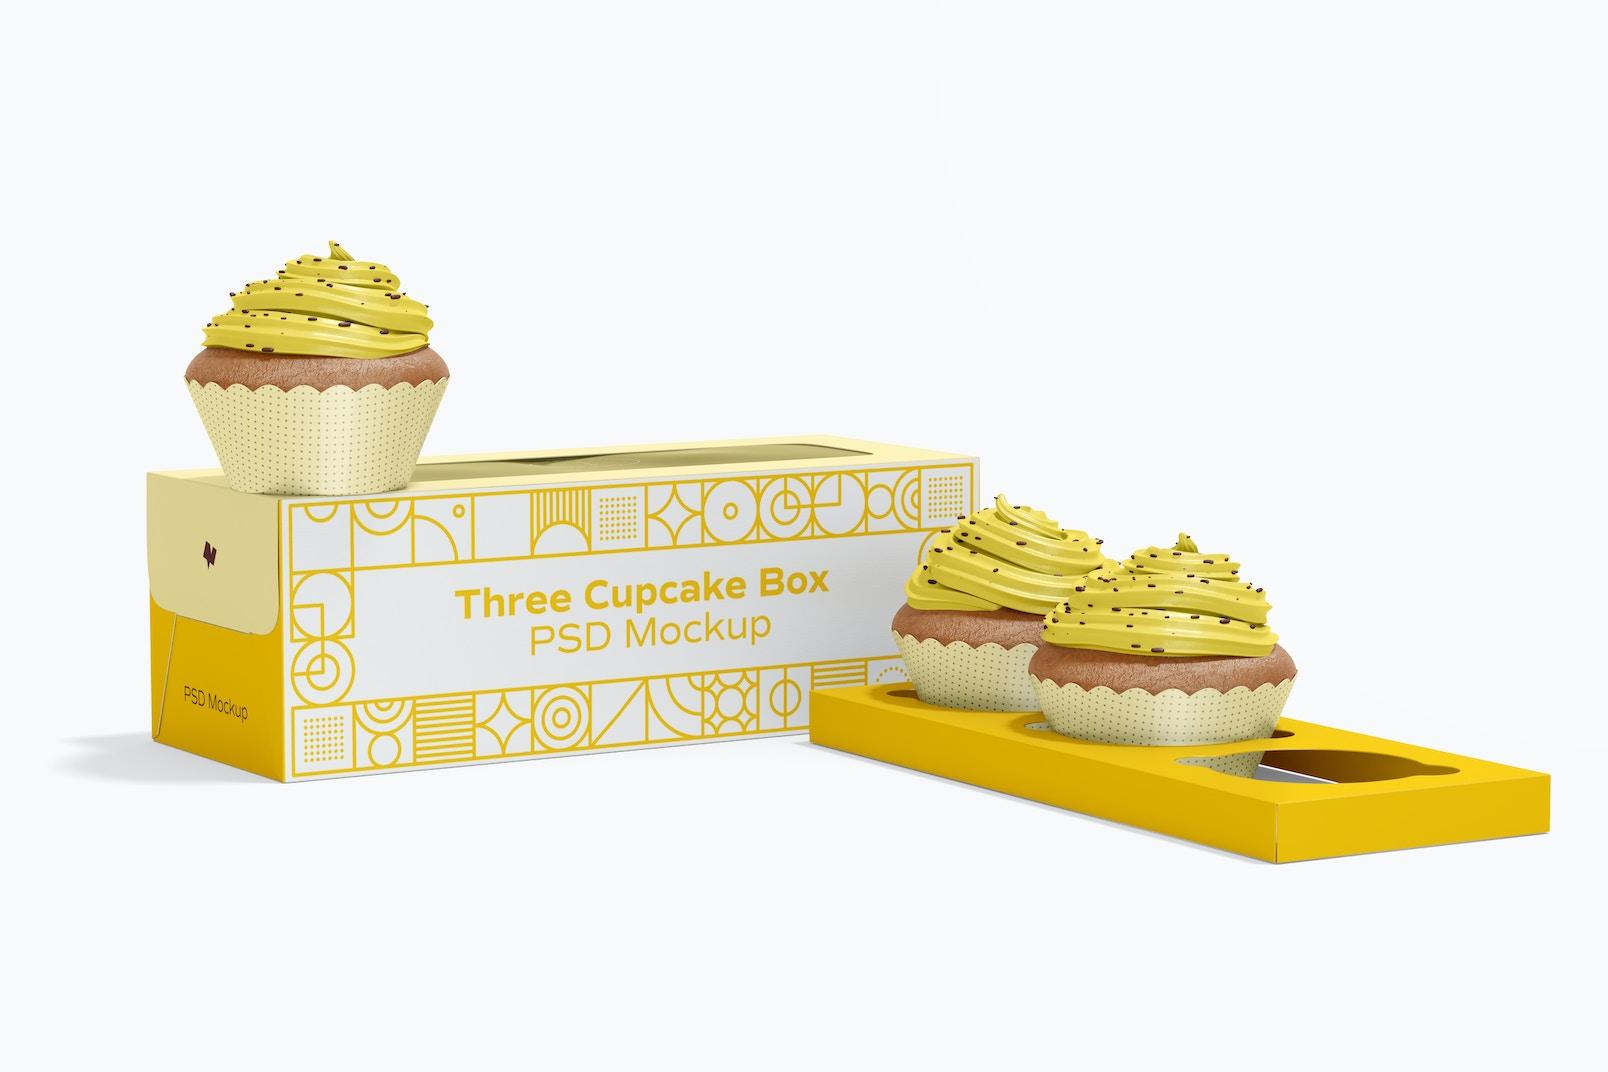 Three Cupcake Box Mockup, Perspective